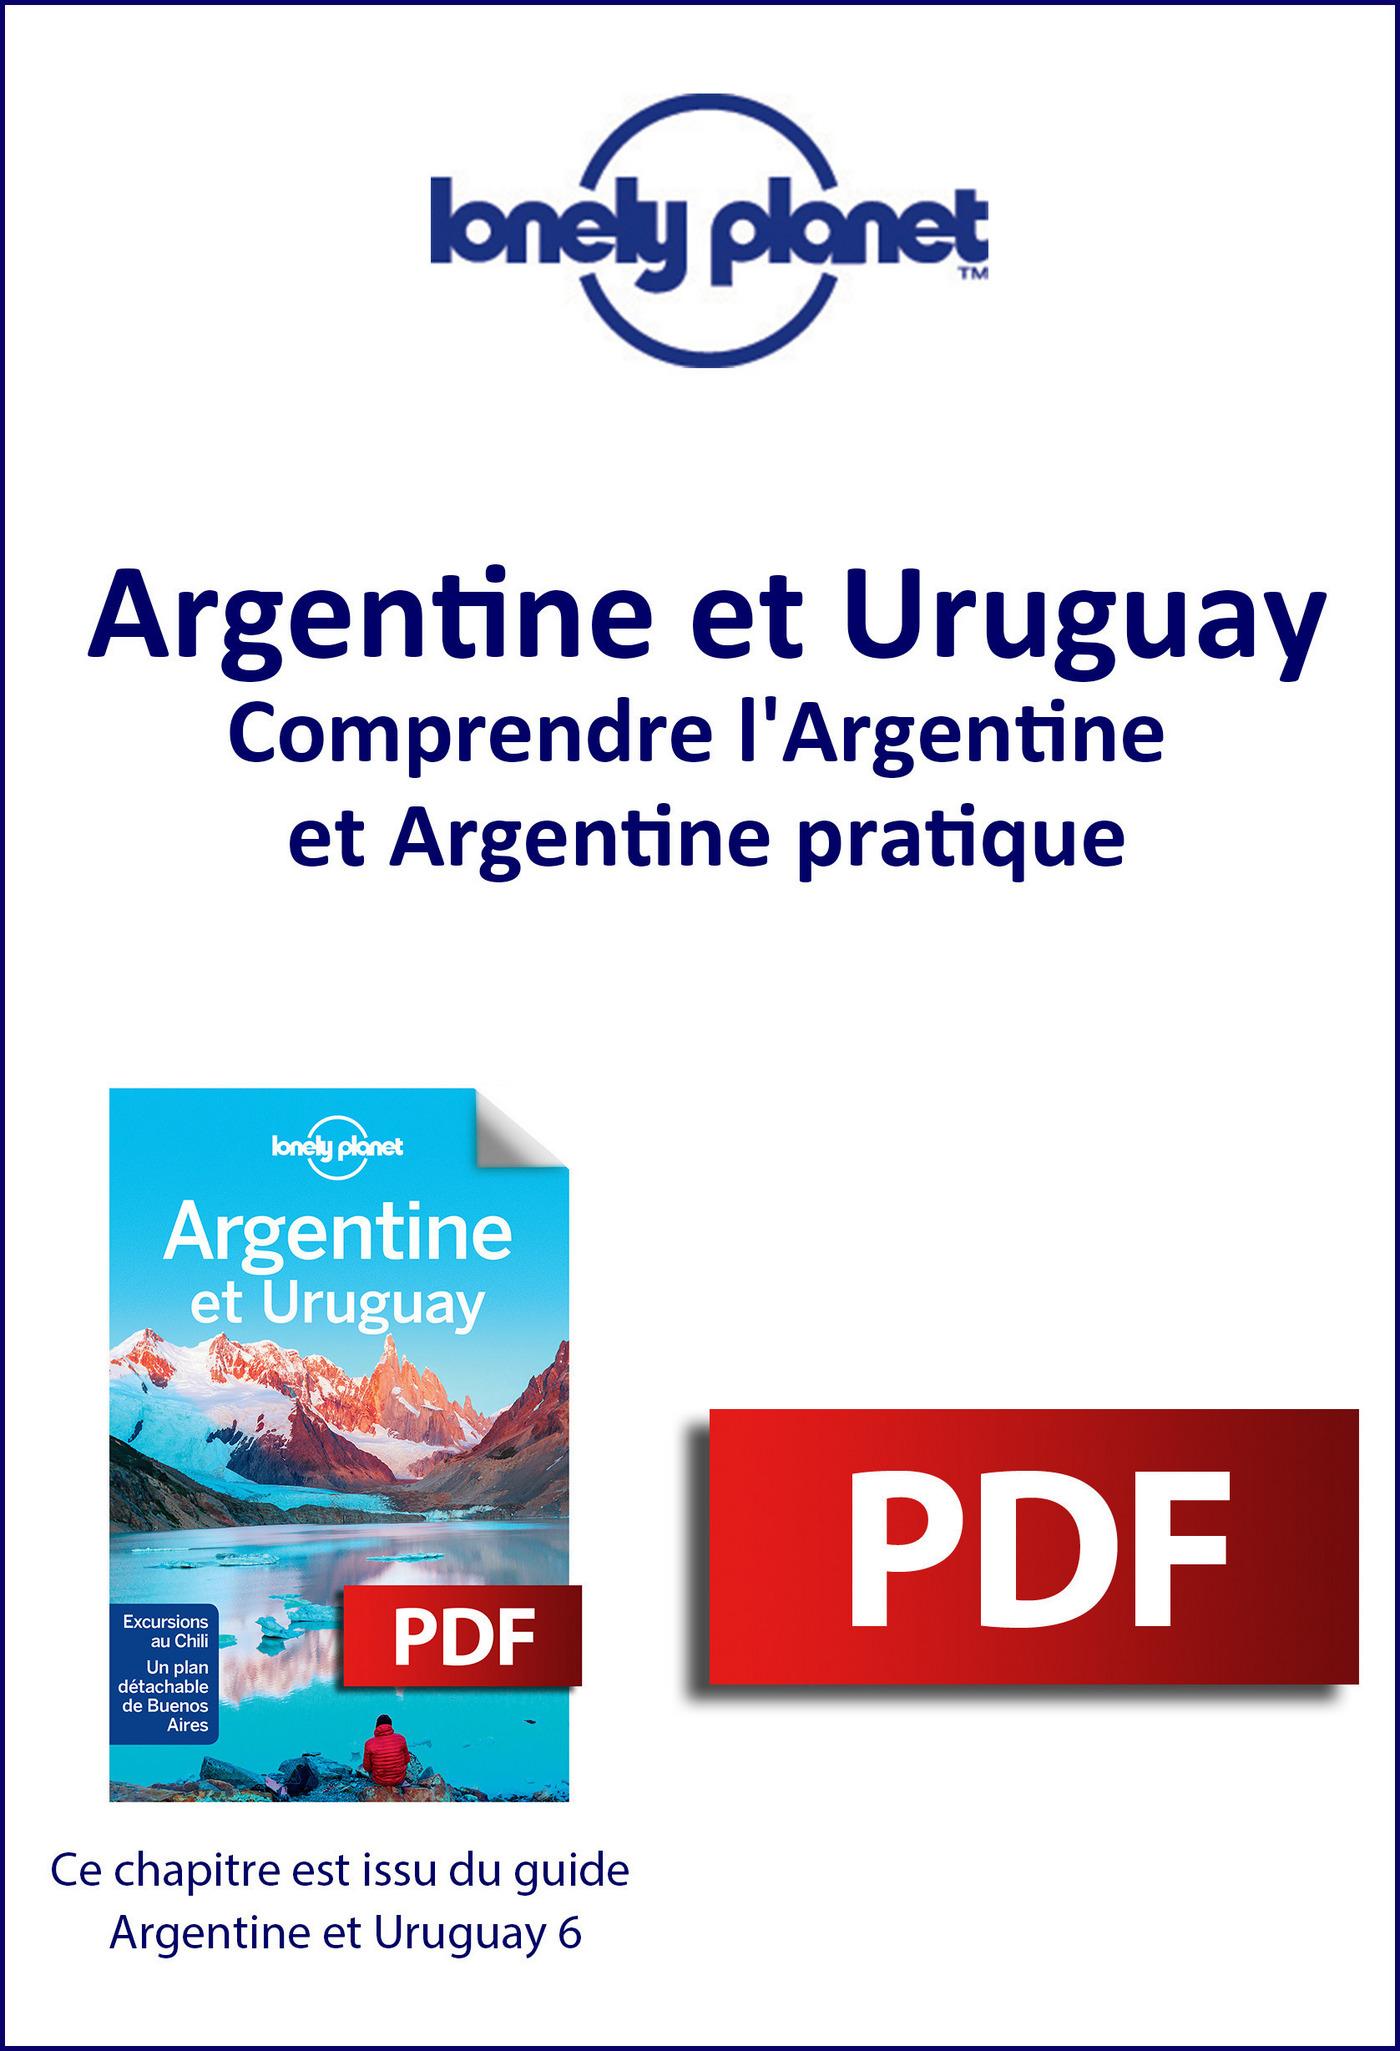 Argentine et Uruguay 6 - Comprendre l'Argentine et Argentine pratique